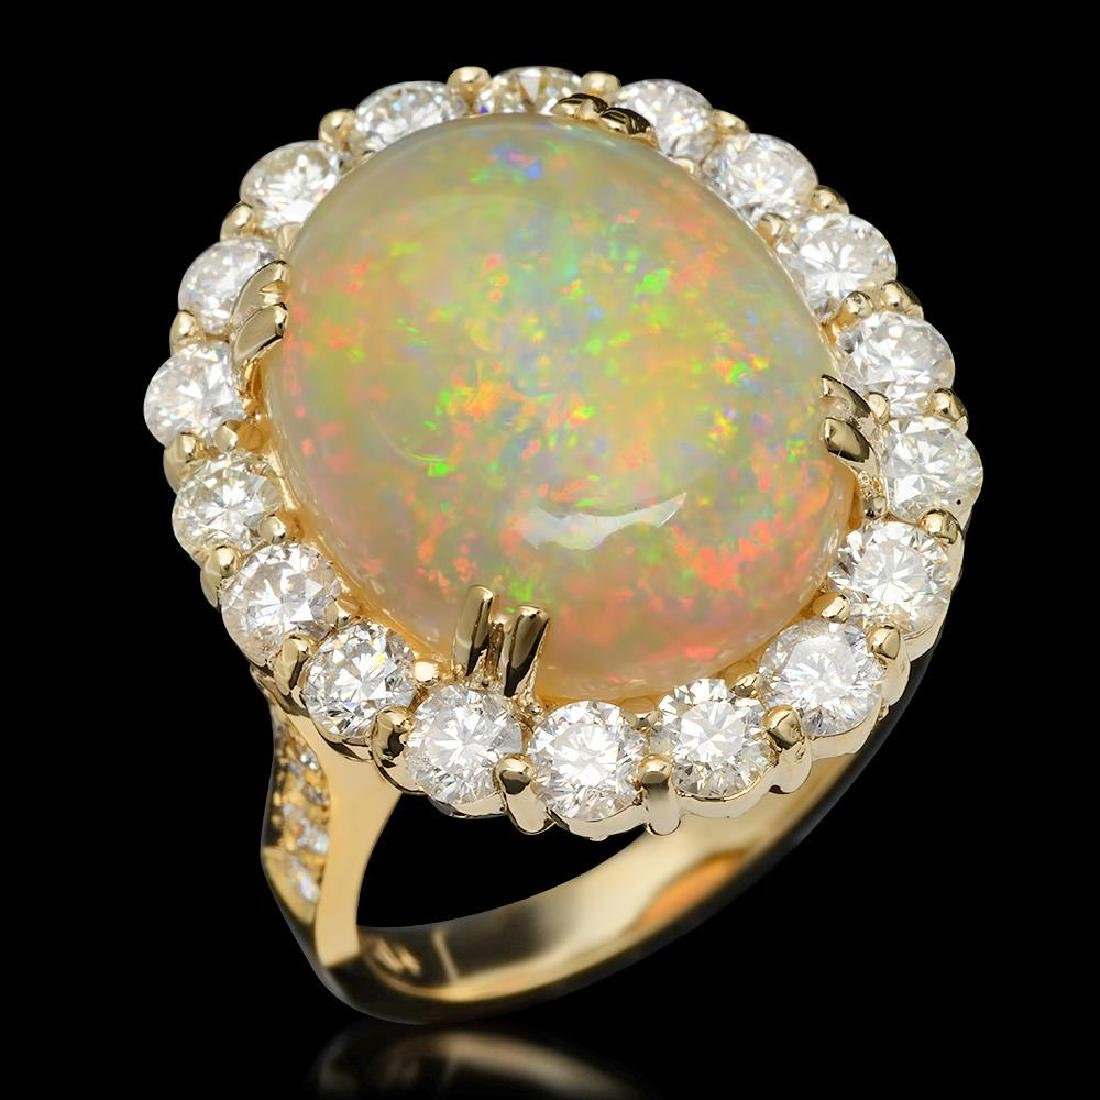 14K Gold 8.38ct Opal & 2.60ct Diamond Ring